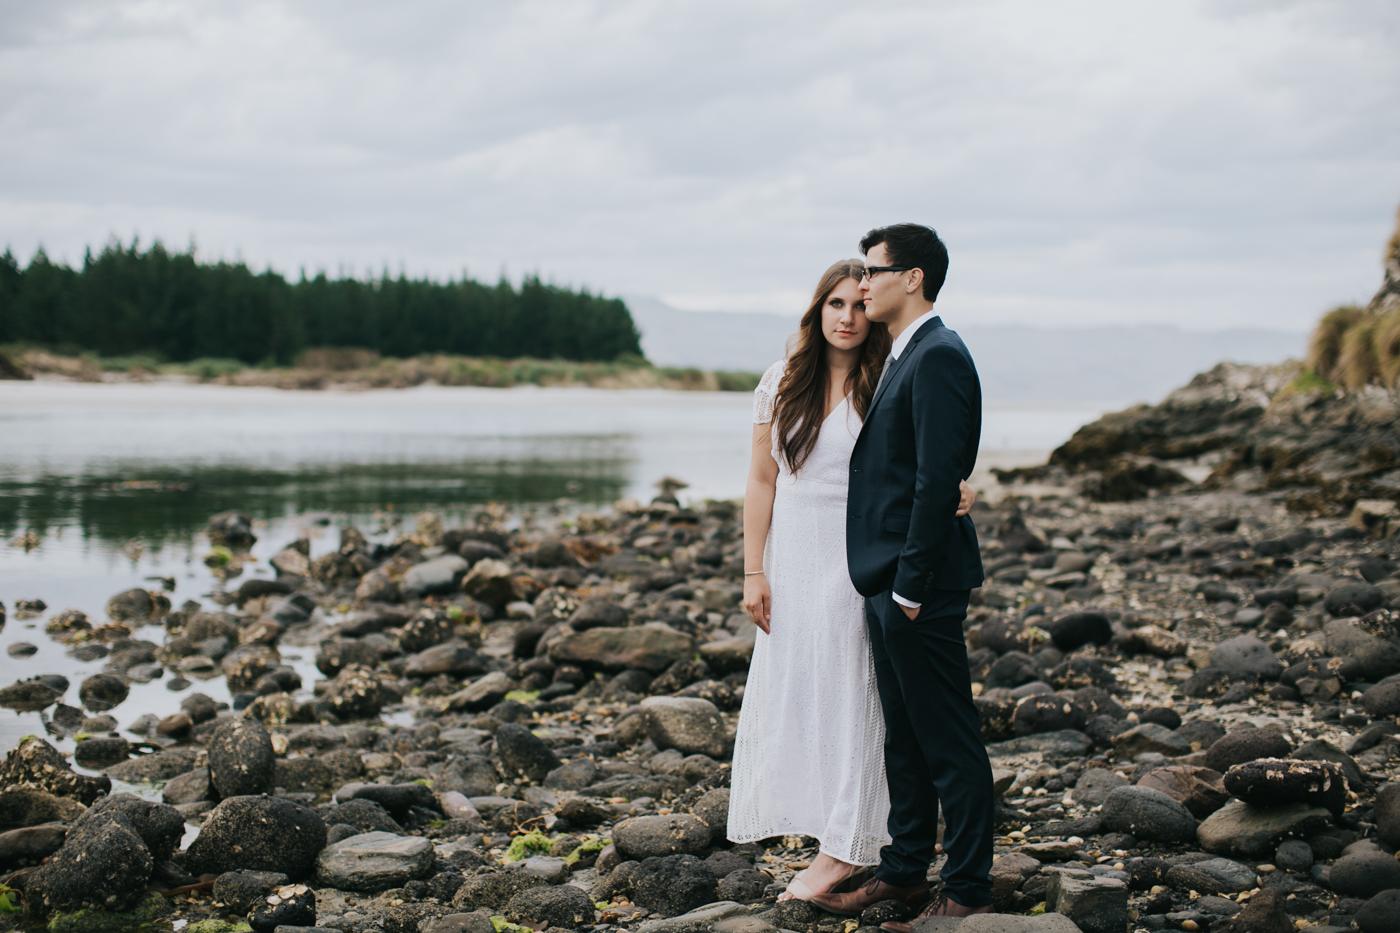 Ariana & Tim - Dunedin, New Zealand Wedding - Destination Wedding - Samantha Heather Photography-191.jpg